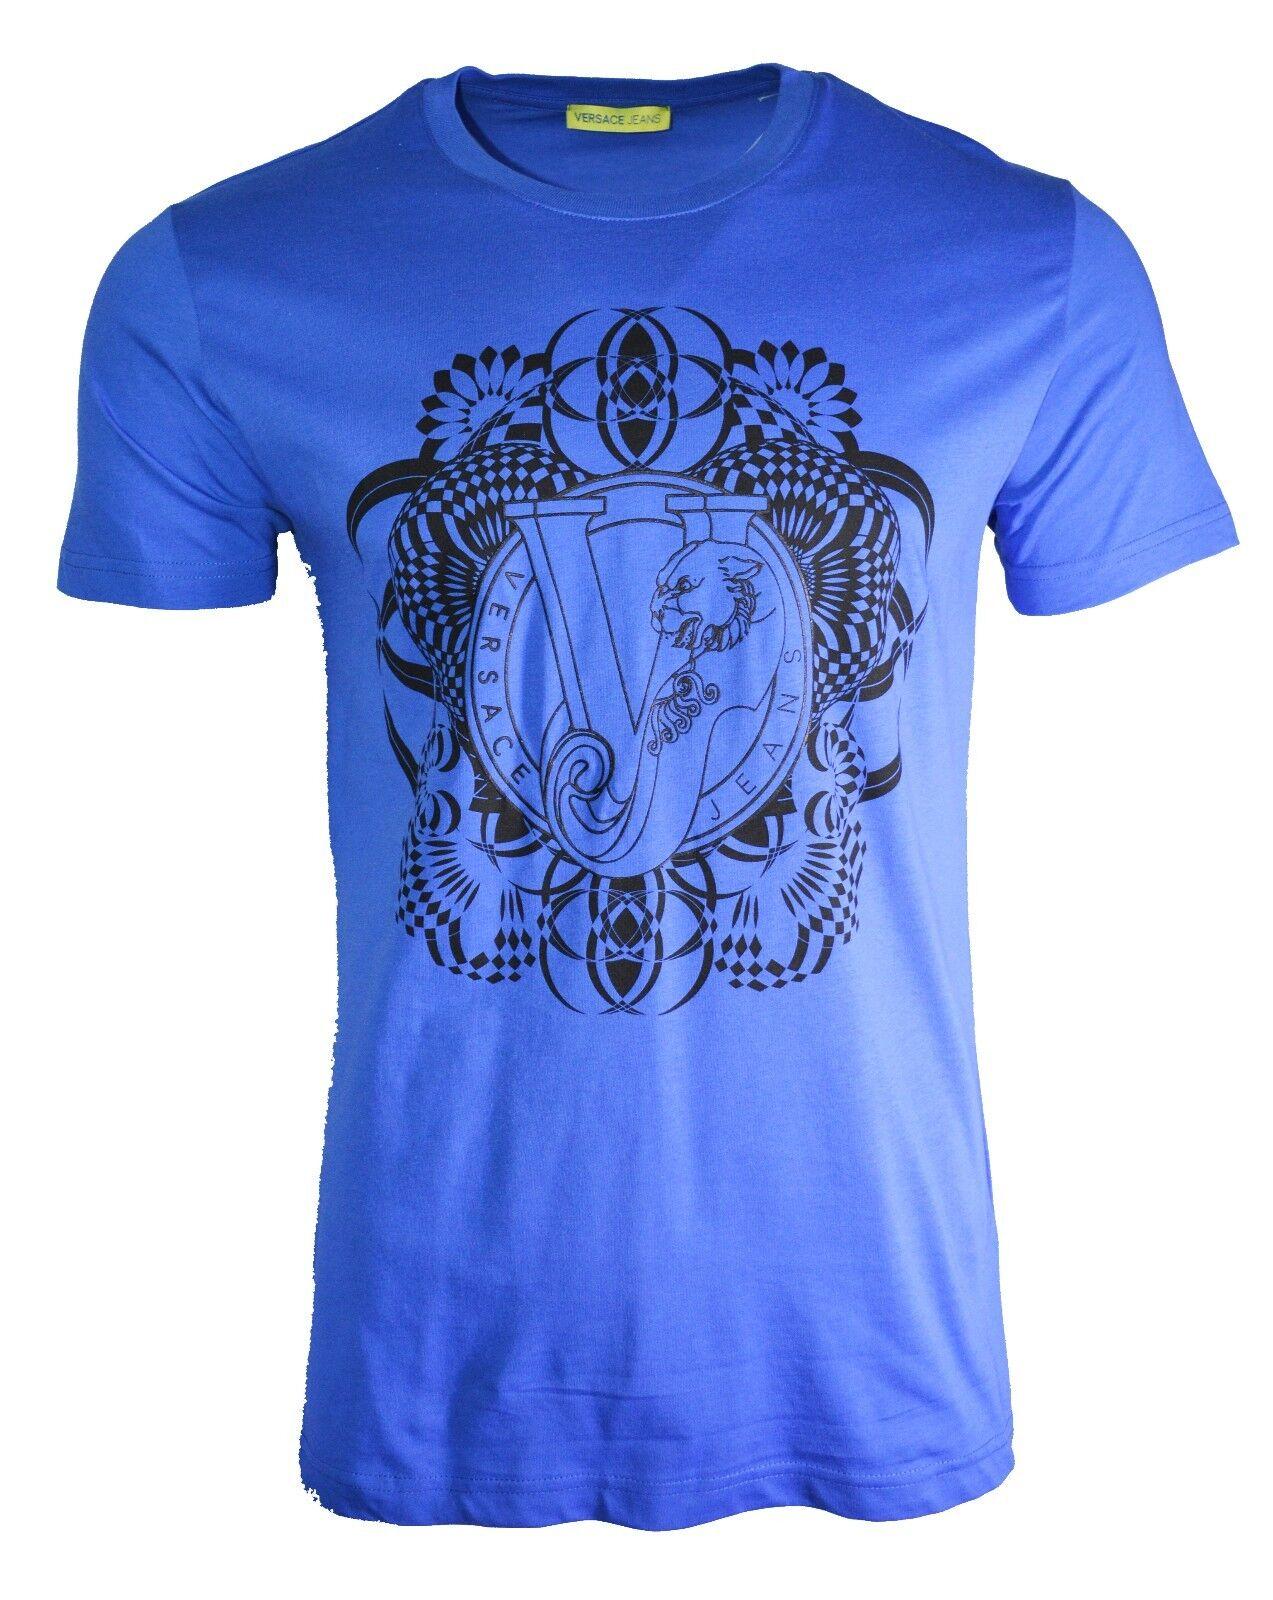 BNWT Versace Jeans VJ Stampa Tigrata T-shirt Blu & Nero